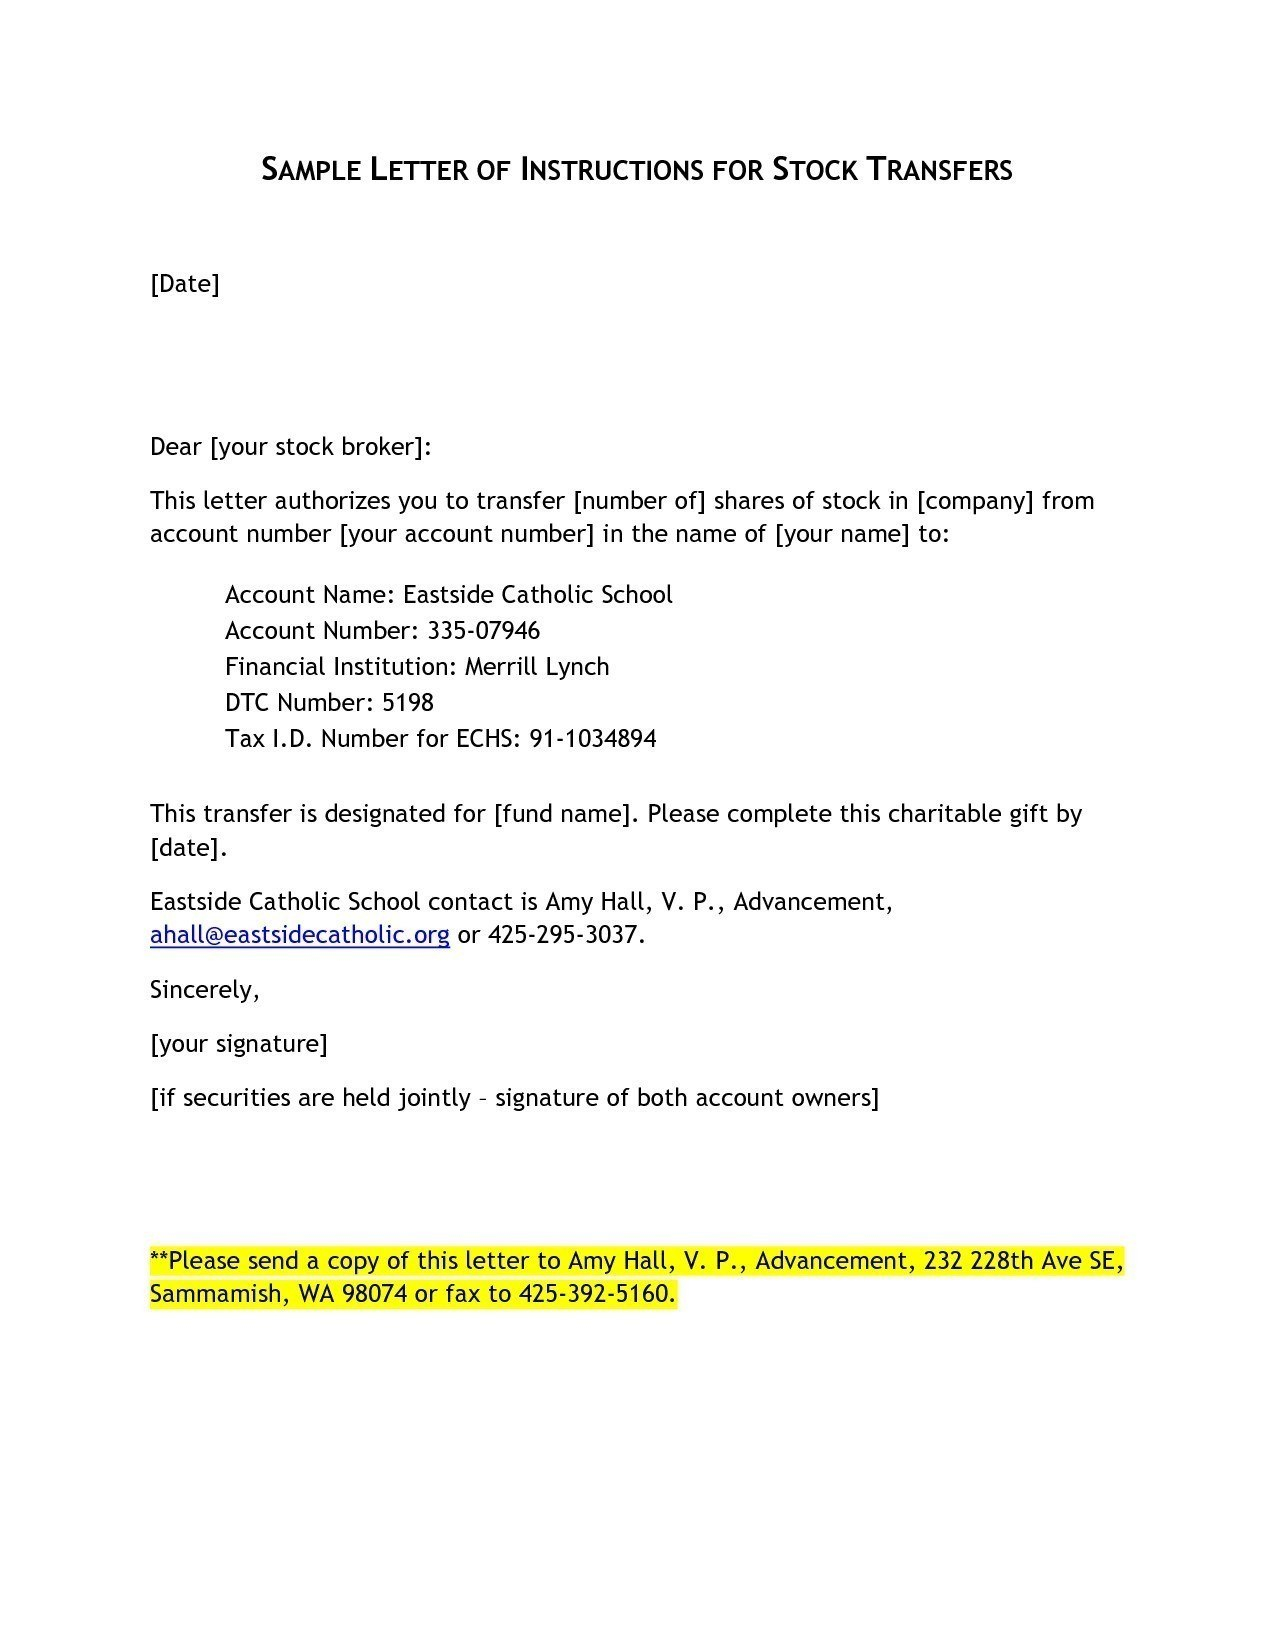 Letter Of Instruction Template Stock Transfer Collection  Letter For Letter Of Instruction Template